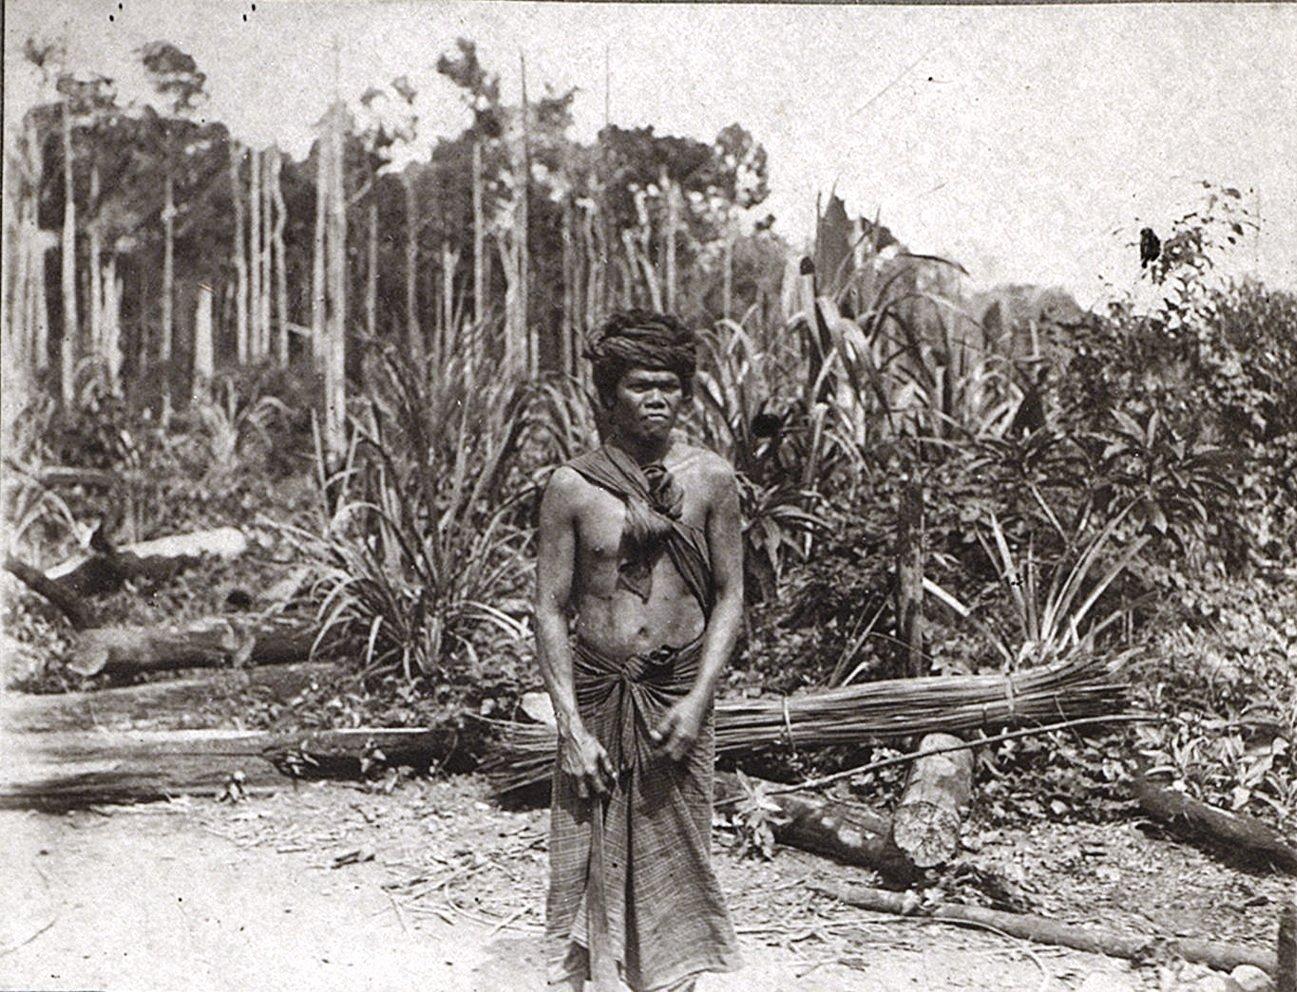 Мужчина в традиционном костюме. Батины. Суматра